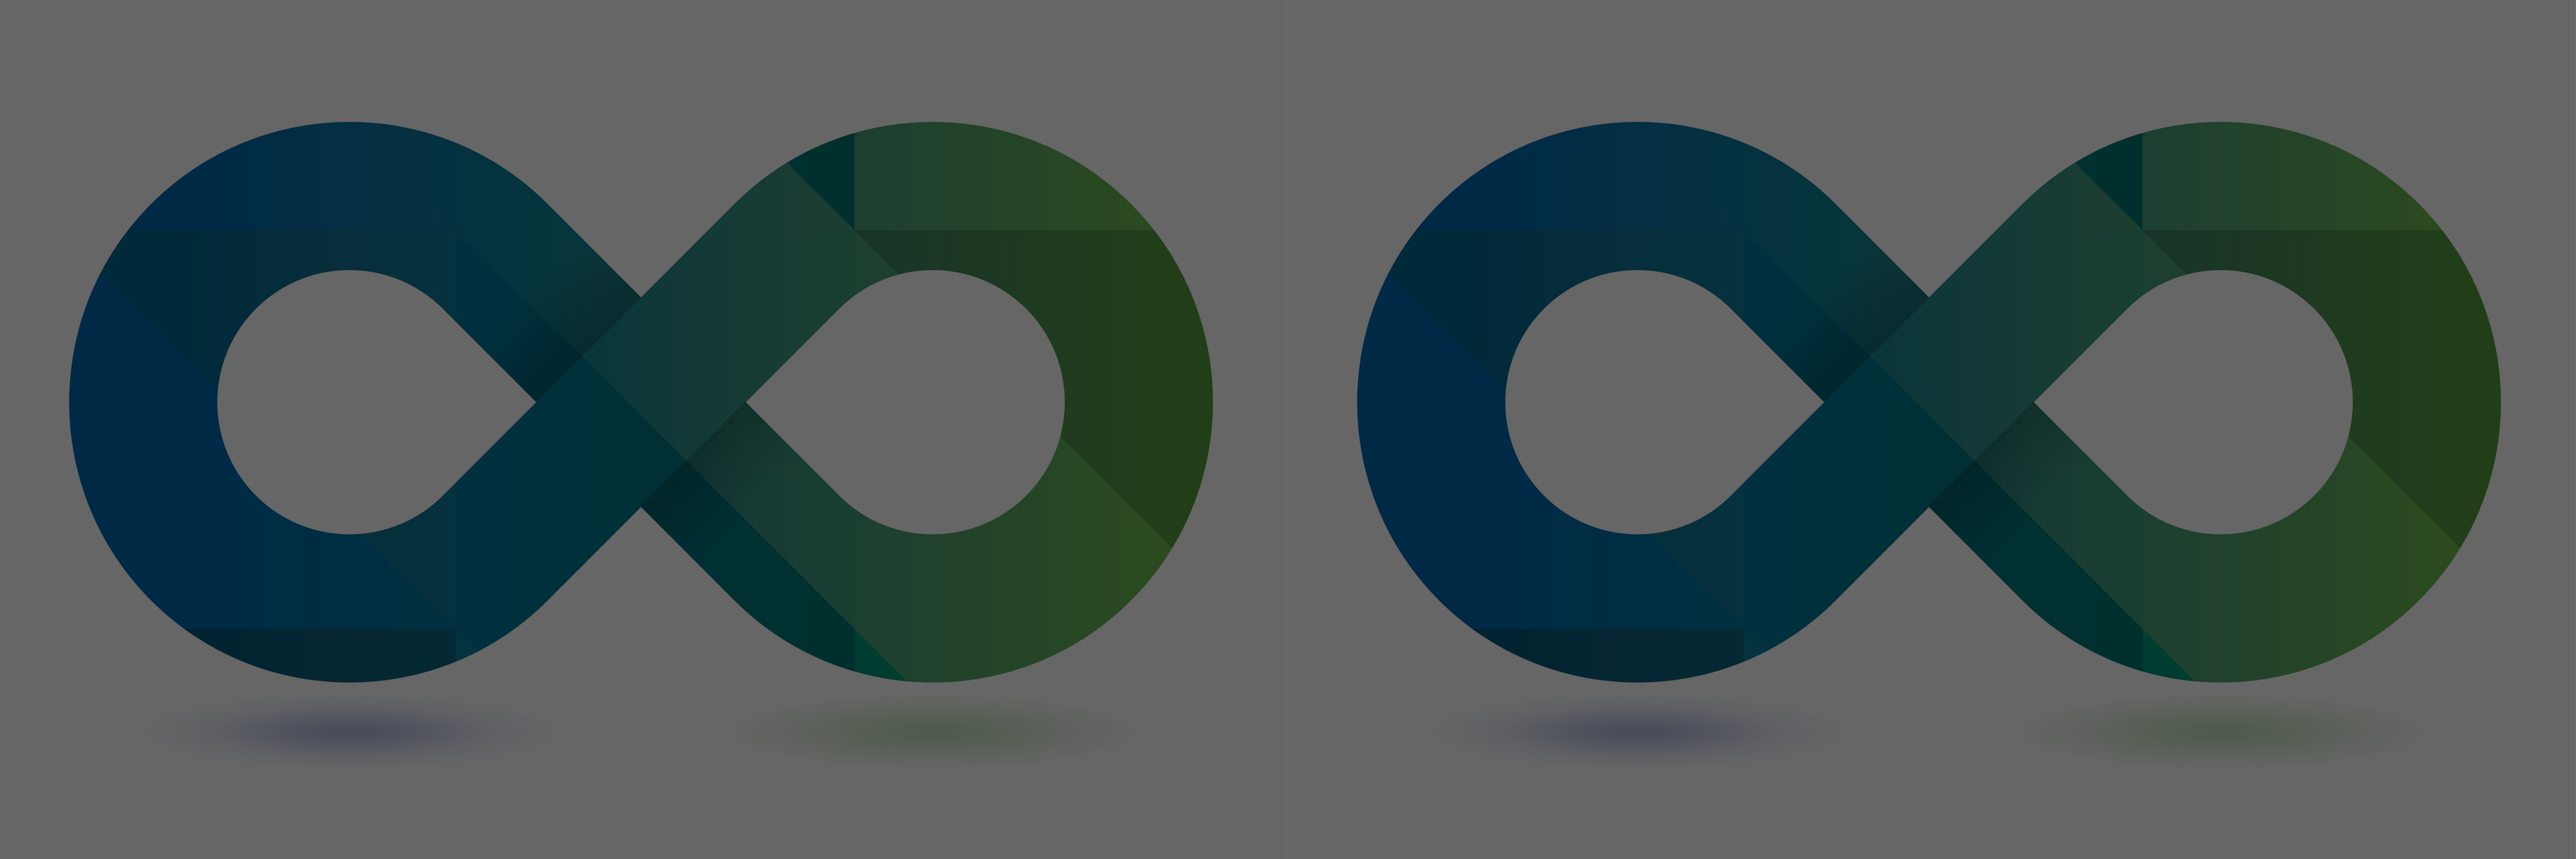 naem-webinar-2017-a-benchmark-process-for-management-of-change-1800x600-min